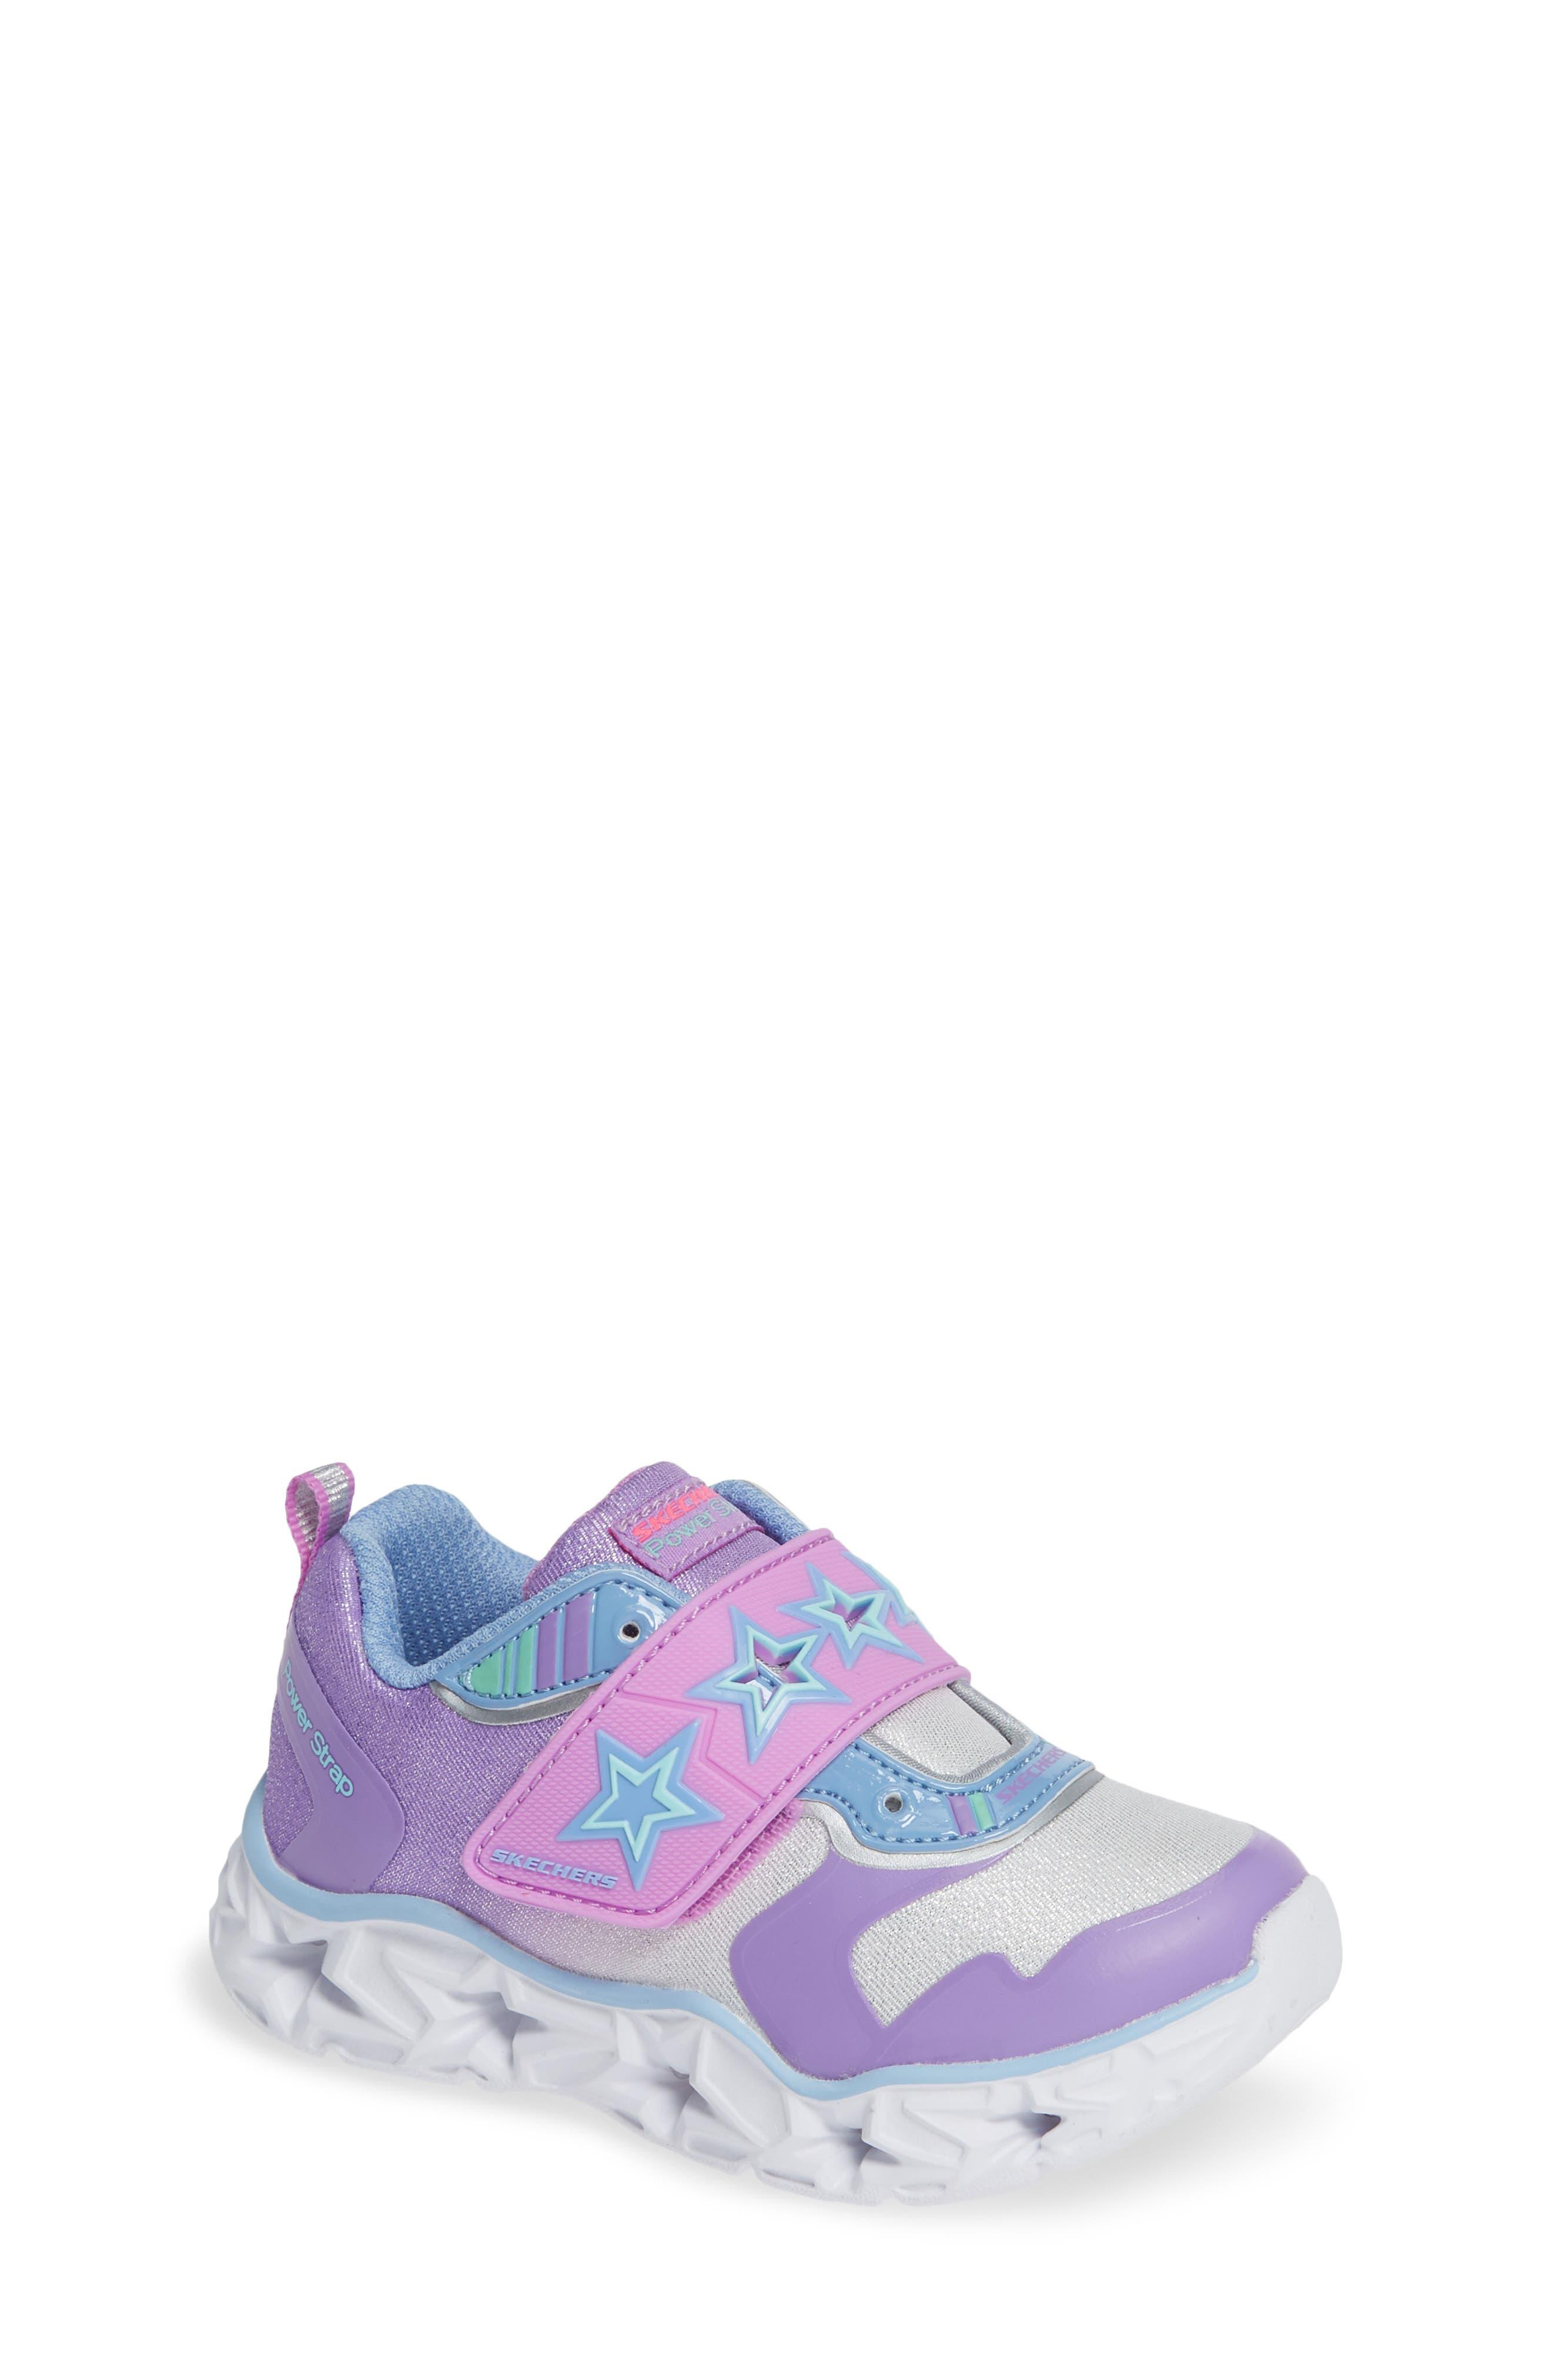 Galaxy Lights Sneakers,                             Main thumbnail 1, color,                             500